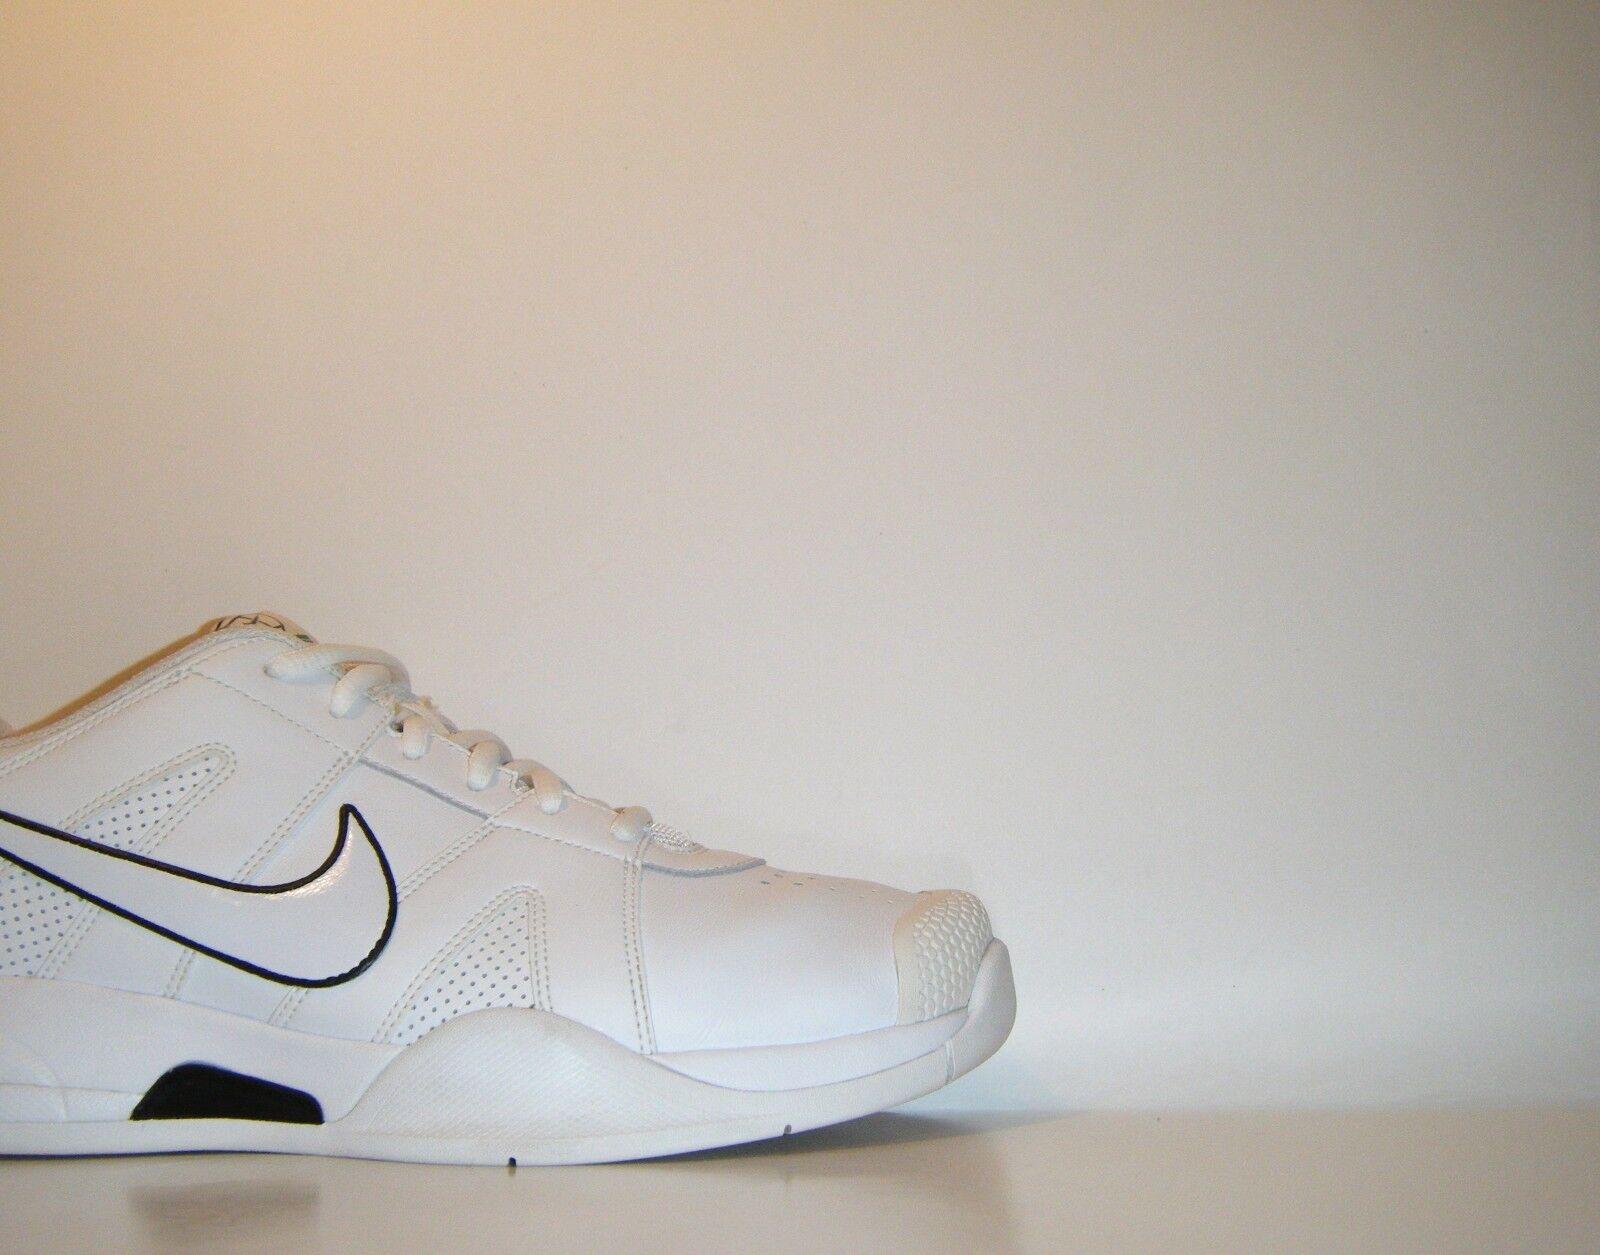 2010 Nike Air Max CourtBallistec 2.2 RAFA NADAL PE PROMO SAMPLE Sz. 10 Federer